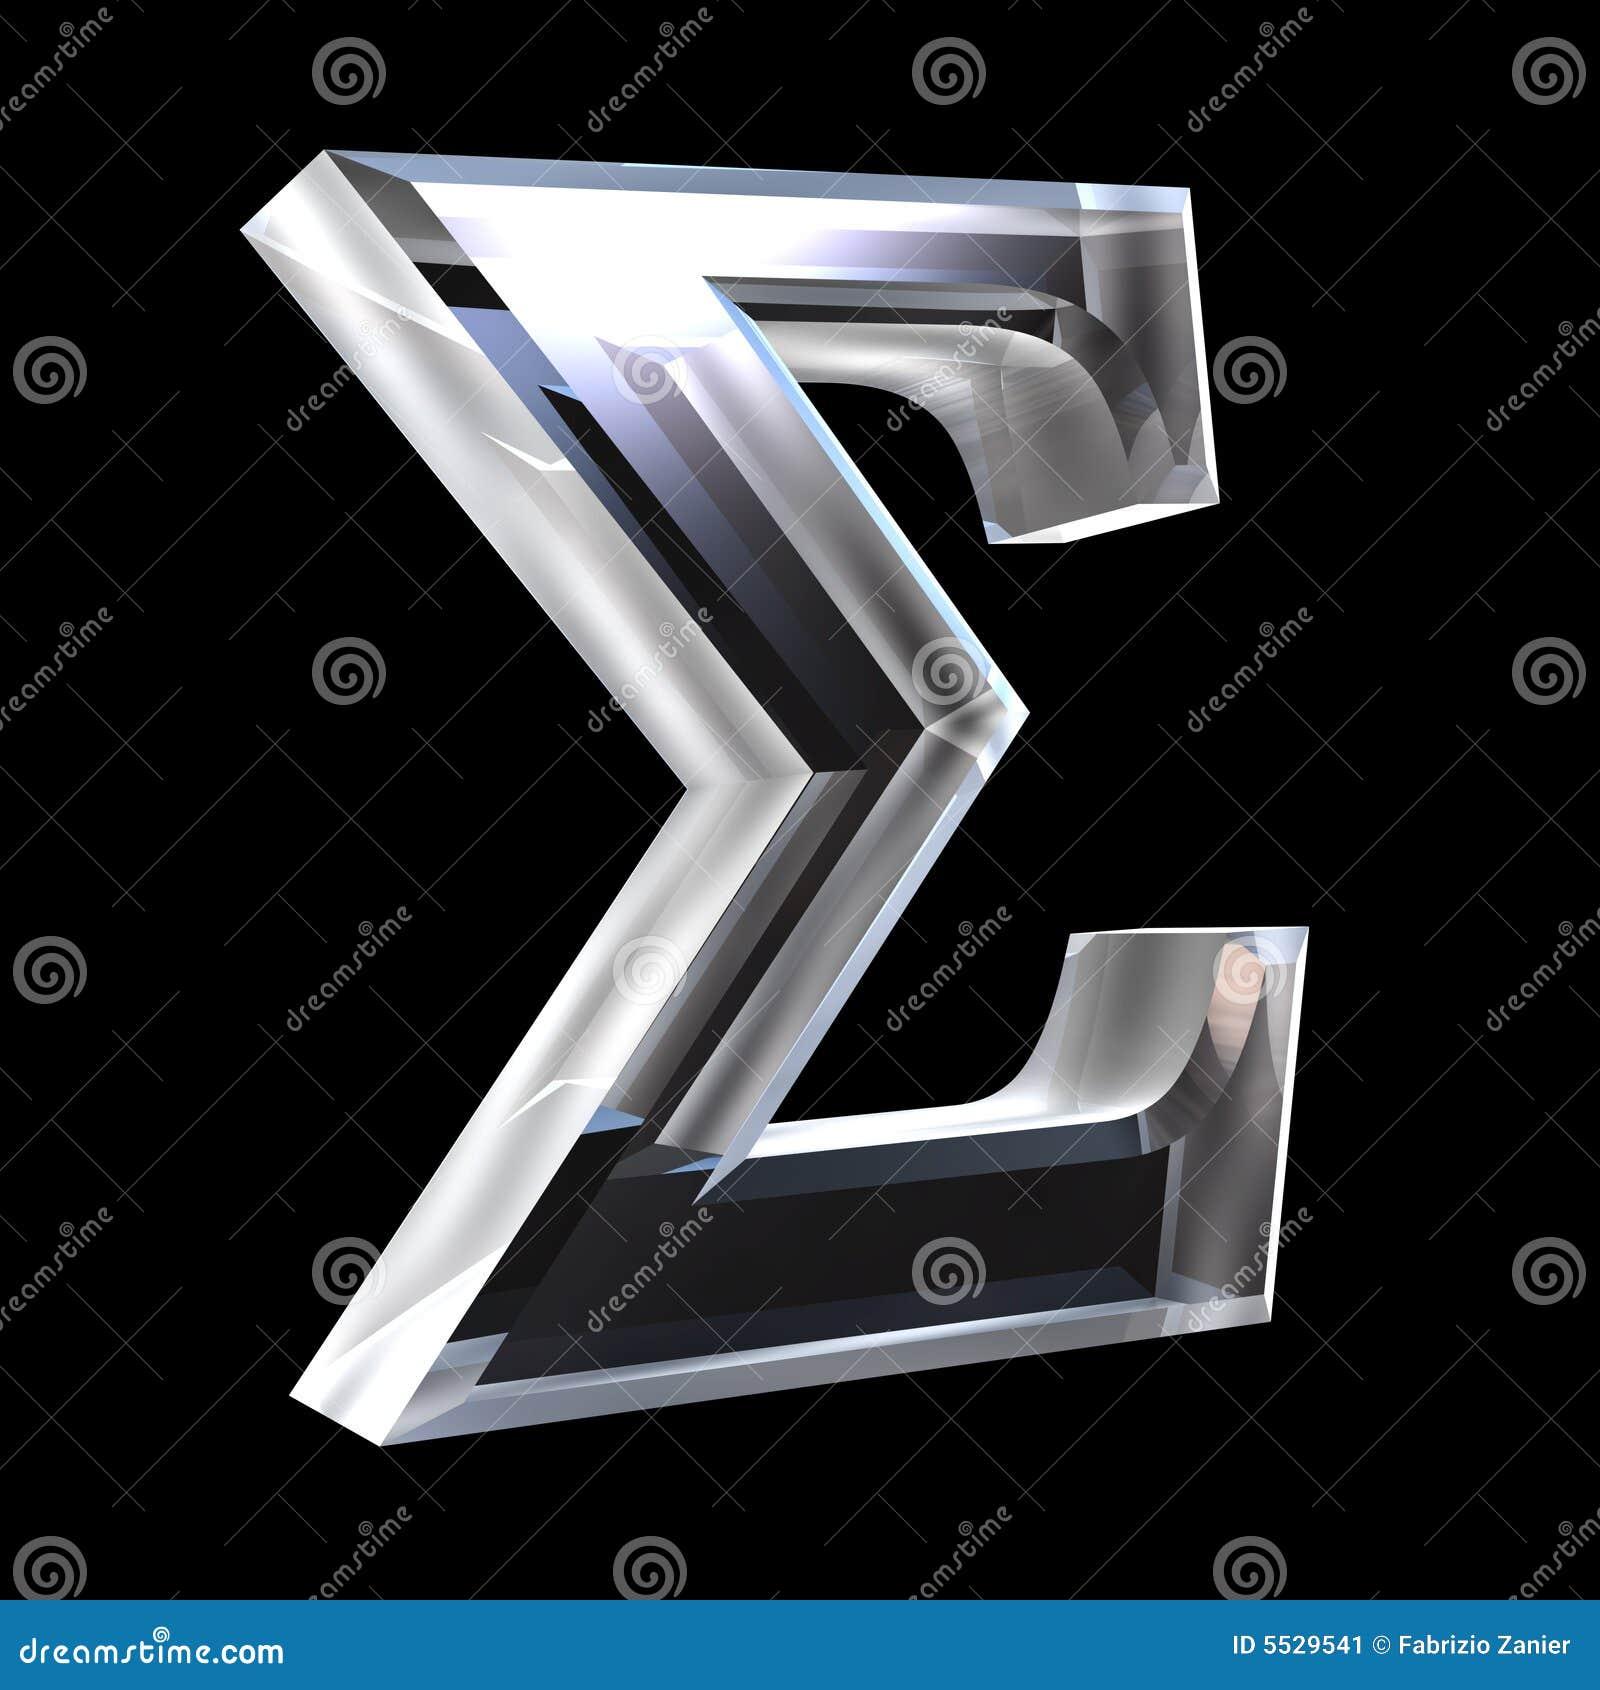 Sigma symbol in glass 3d stock illustration illustration of sigma symbol in glass 3d biocorpaavc Choice Image